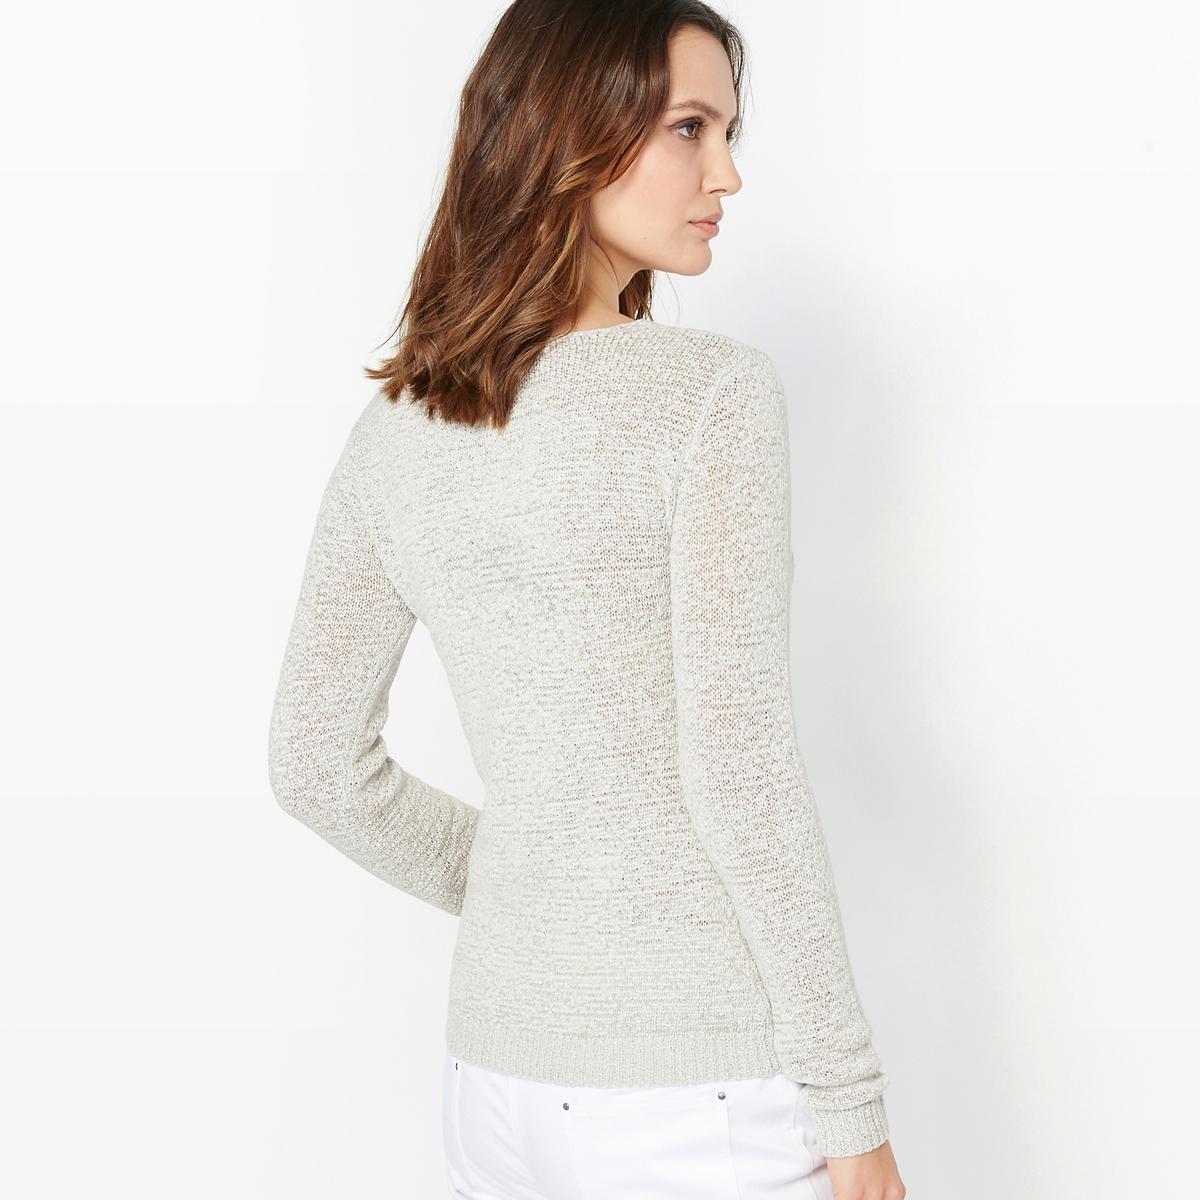 Пуловер из трикотажа с узором косы